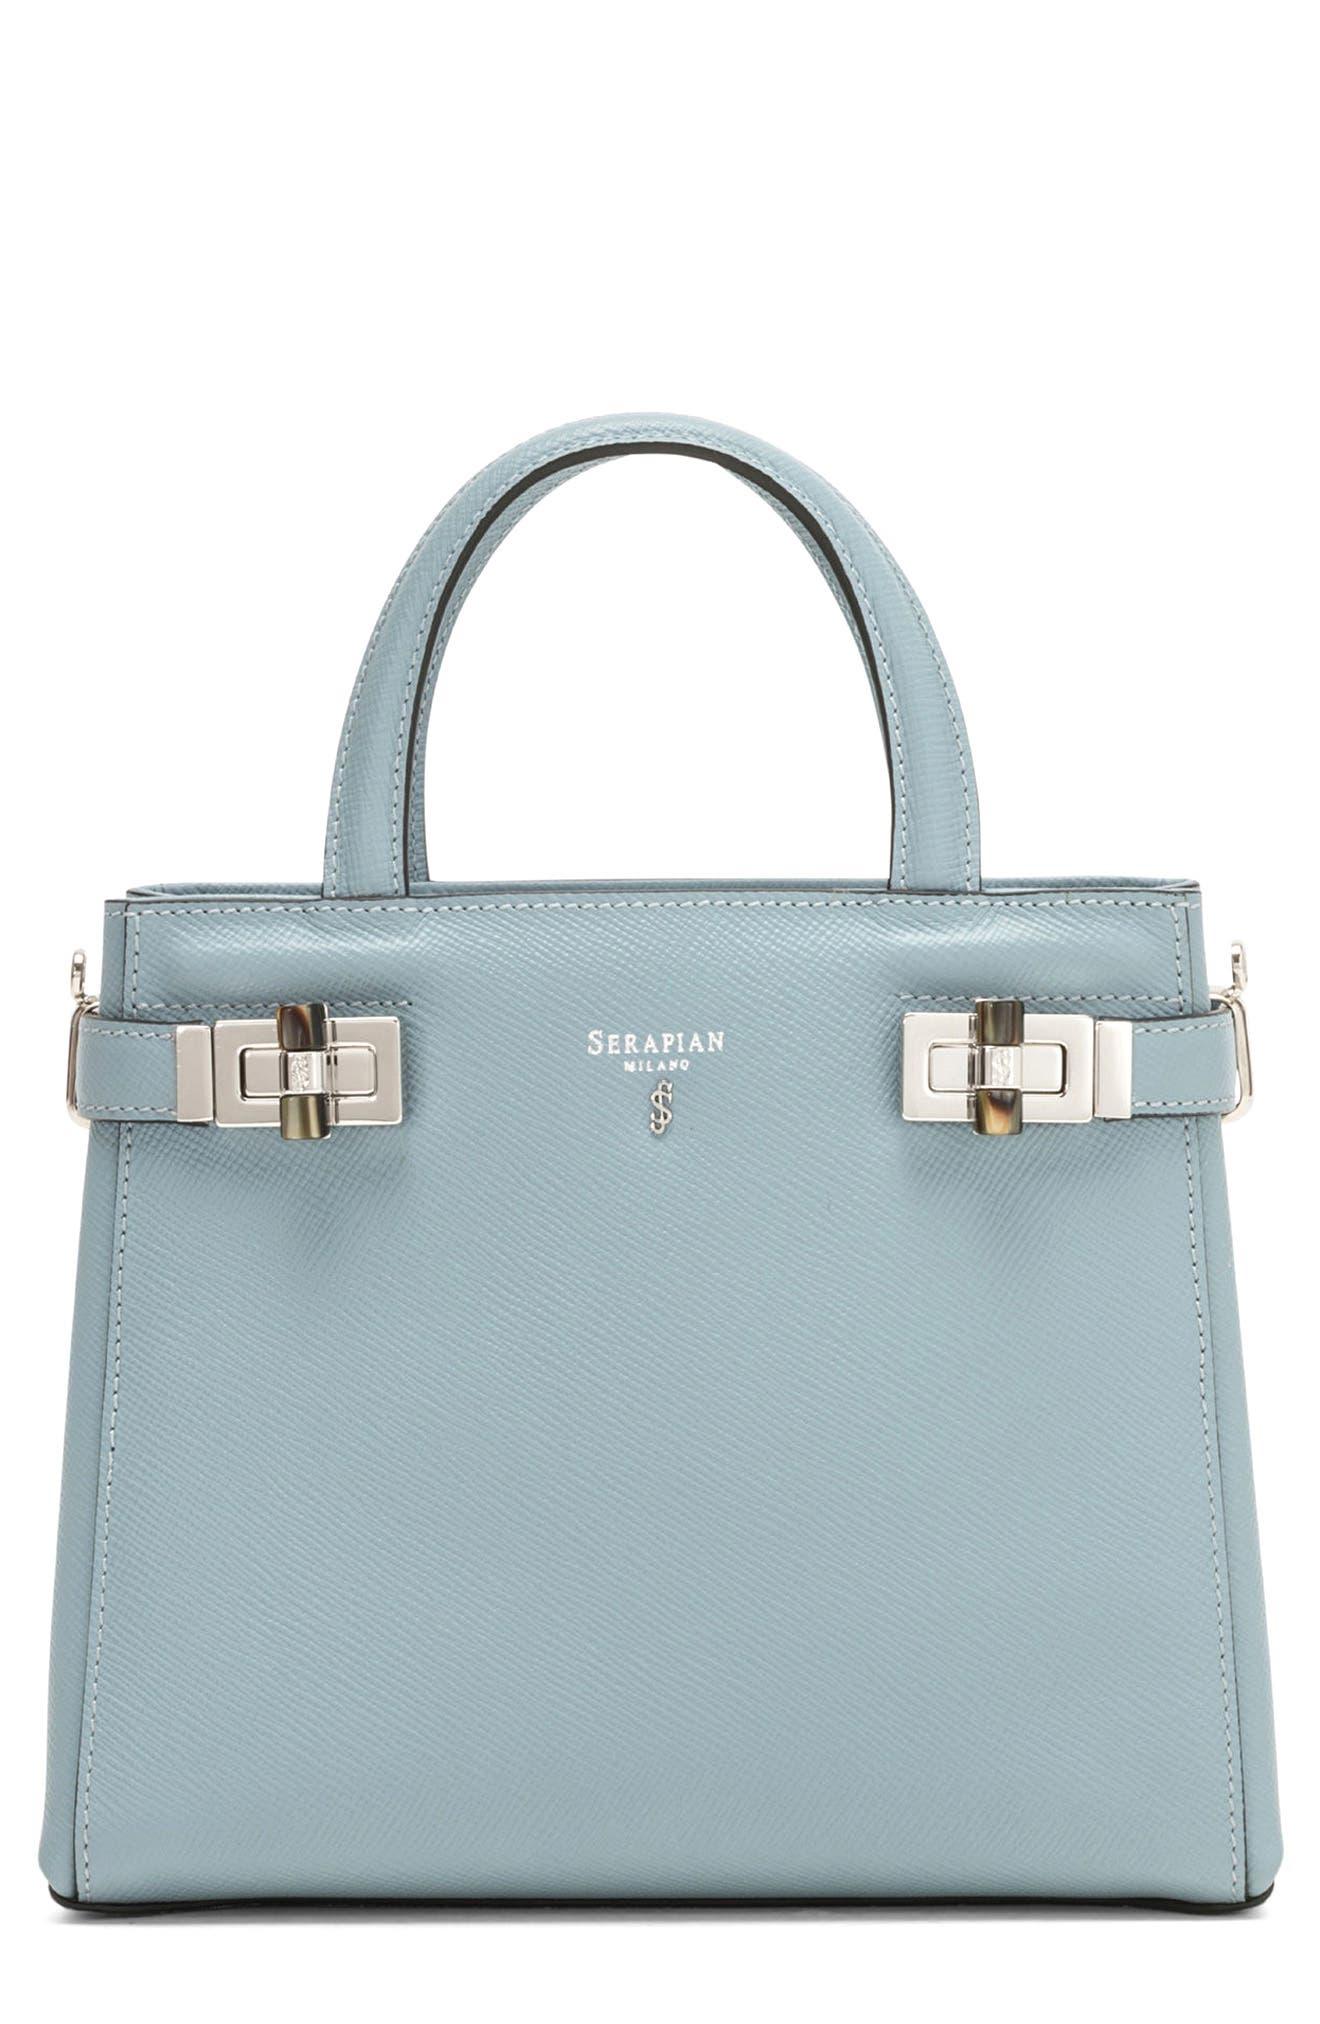 Serapian Milano Mini Meline Evolution Leather Bag